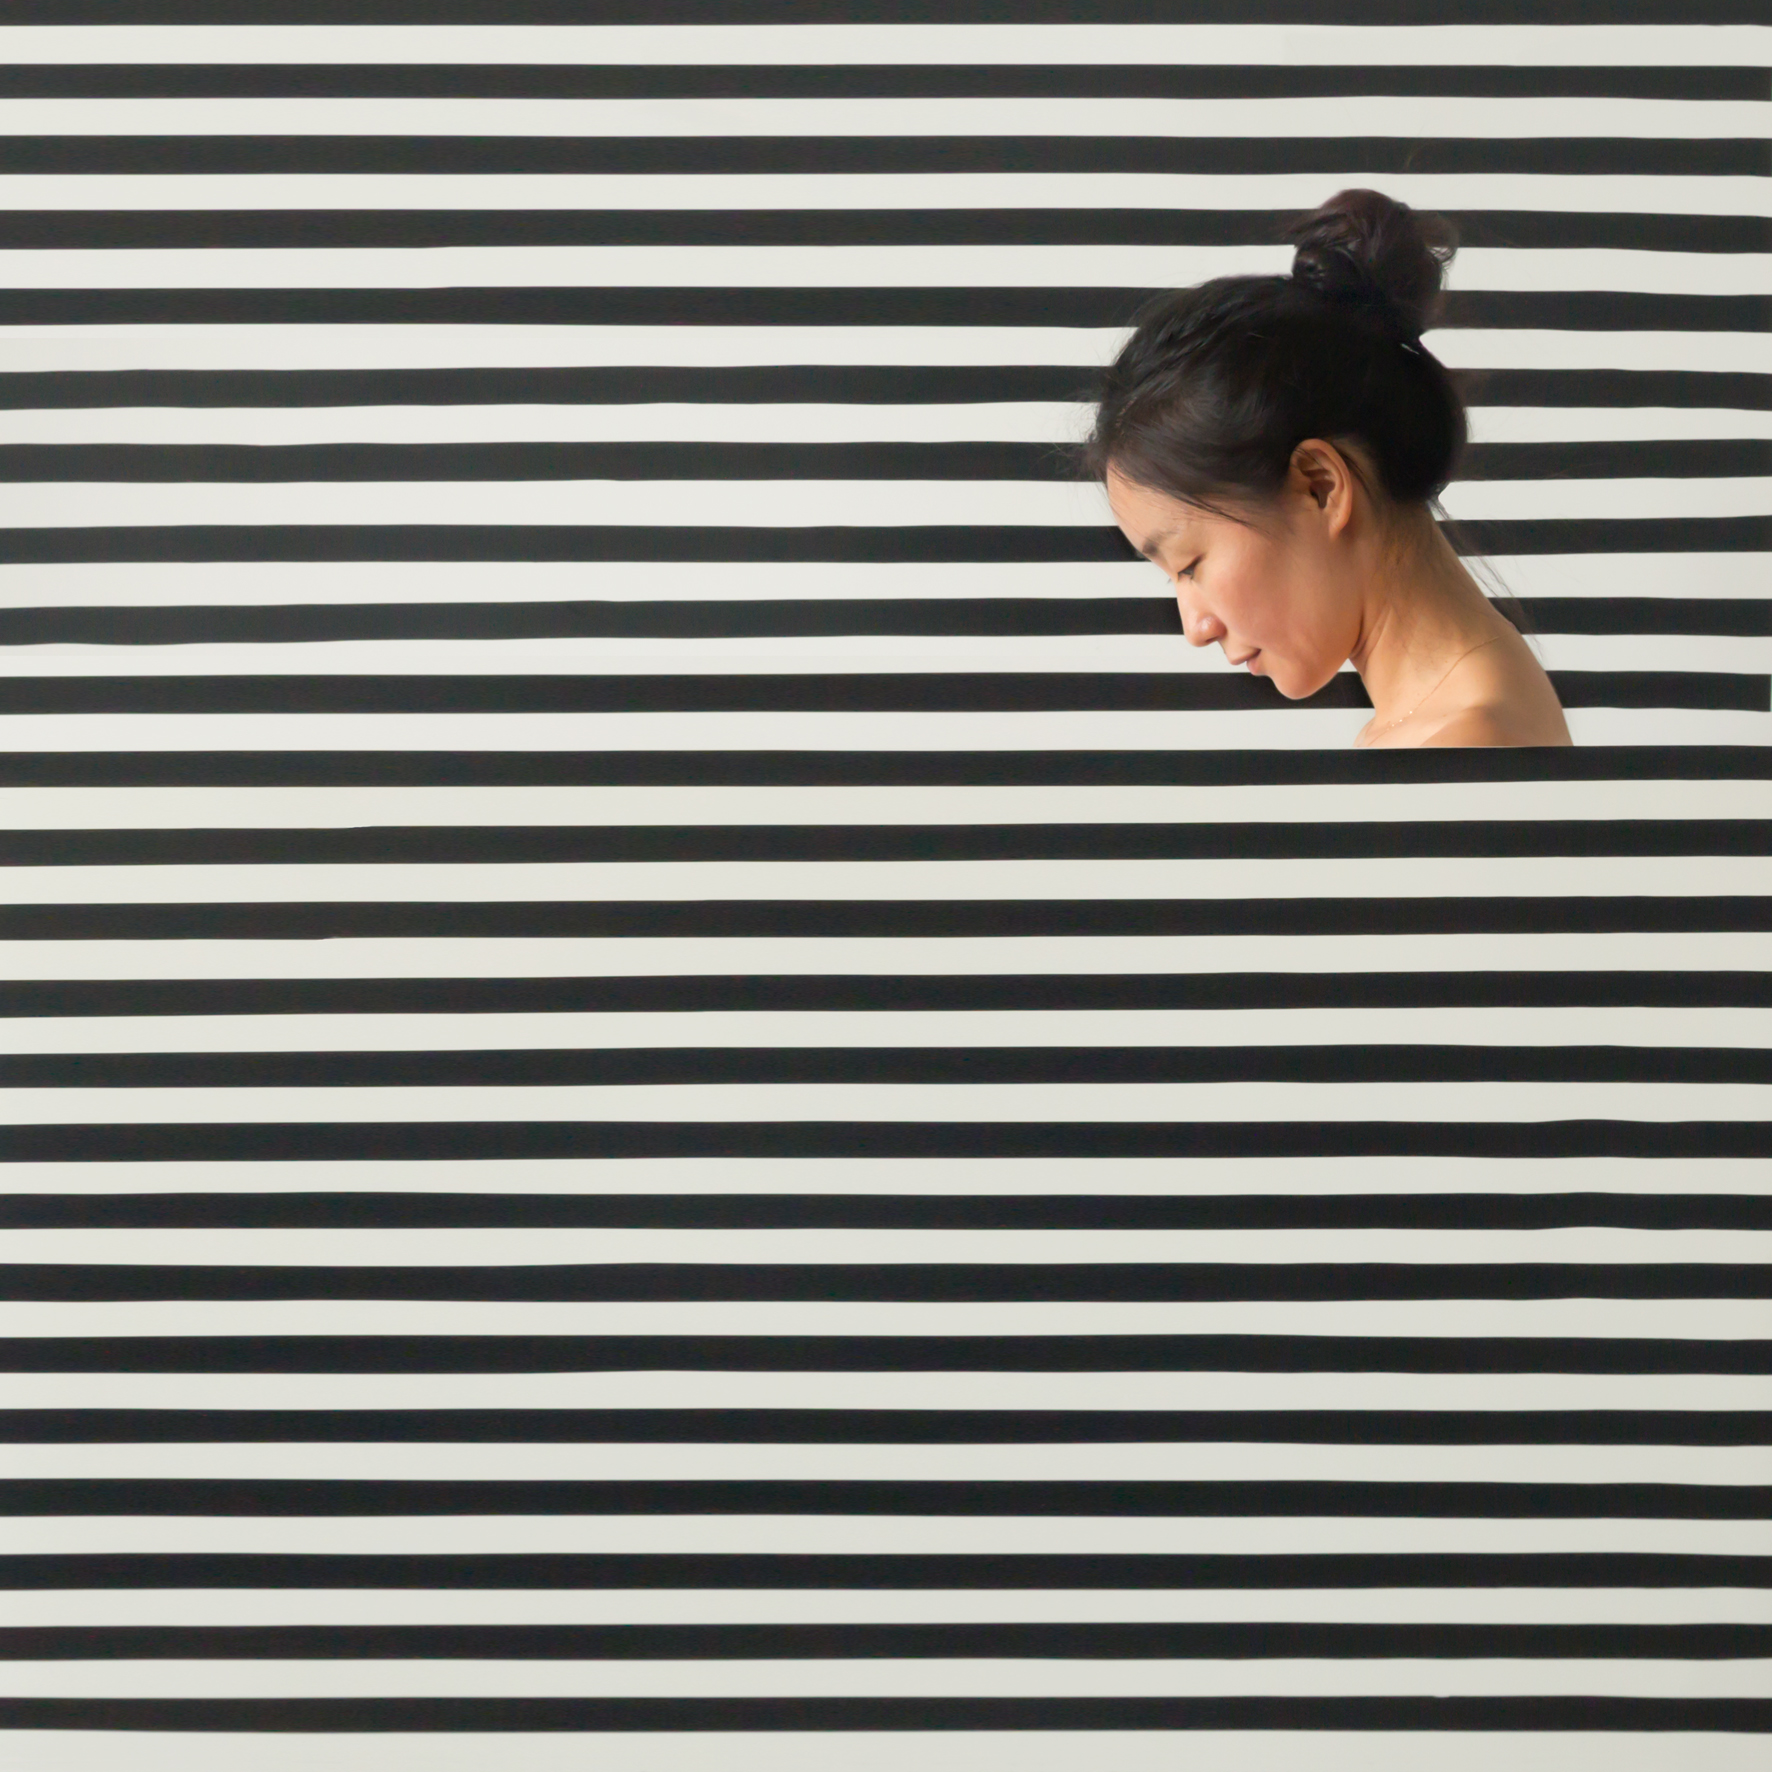 Stripe Tease